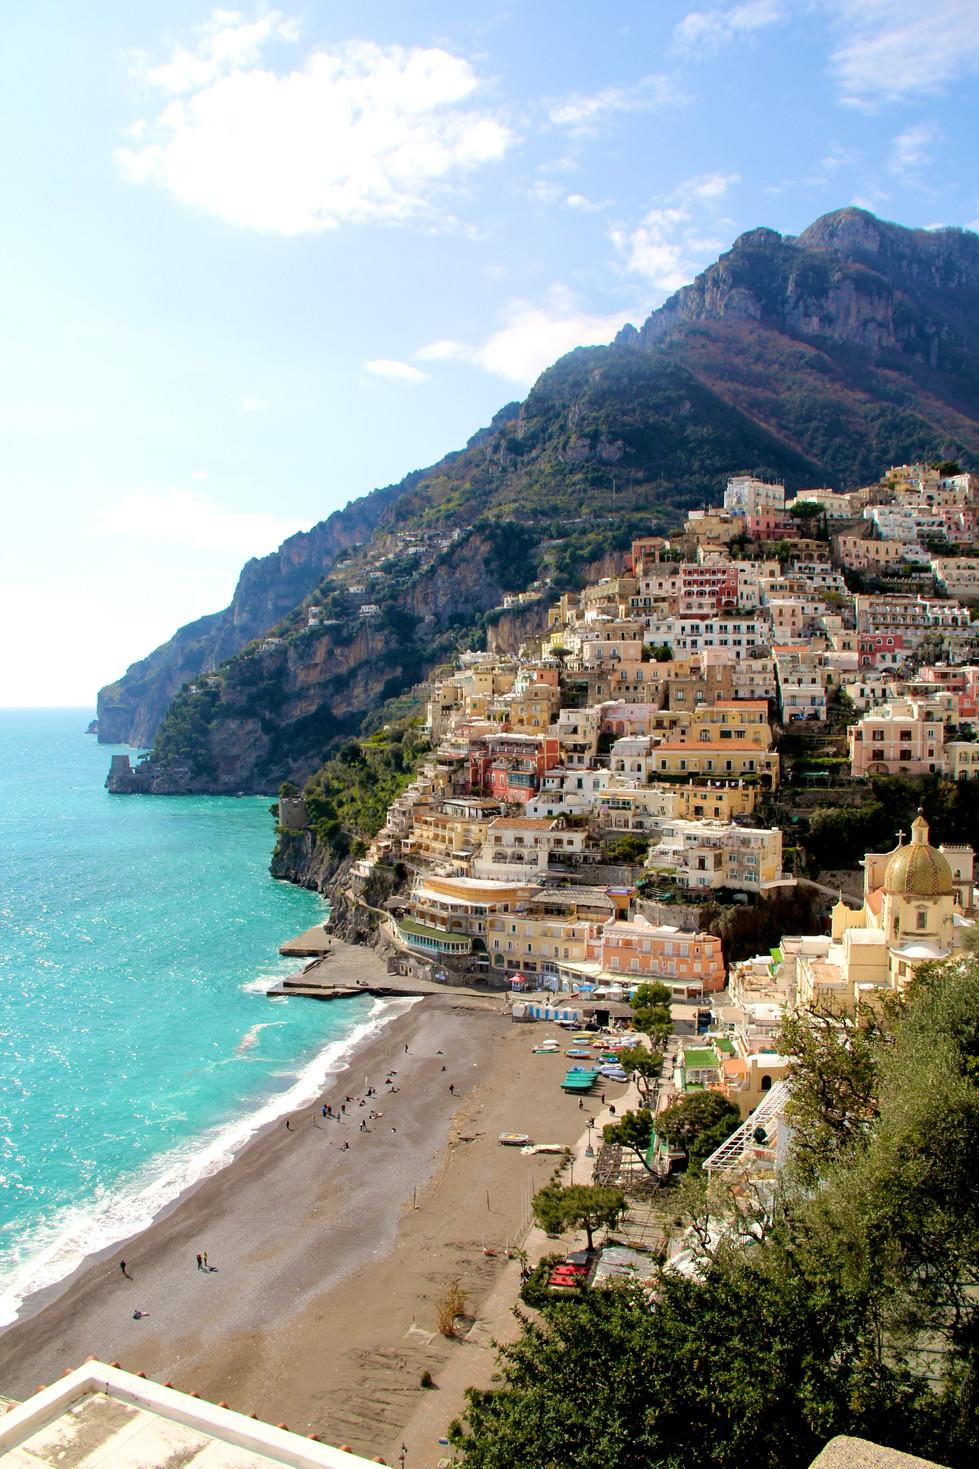 Oh man, Amalfi: SNEAK PEAK